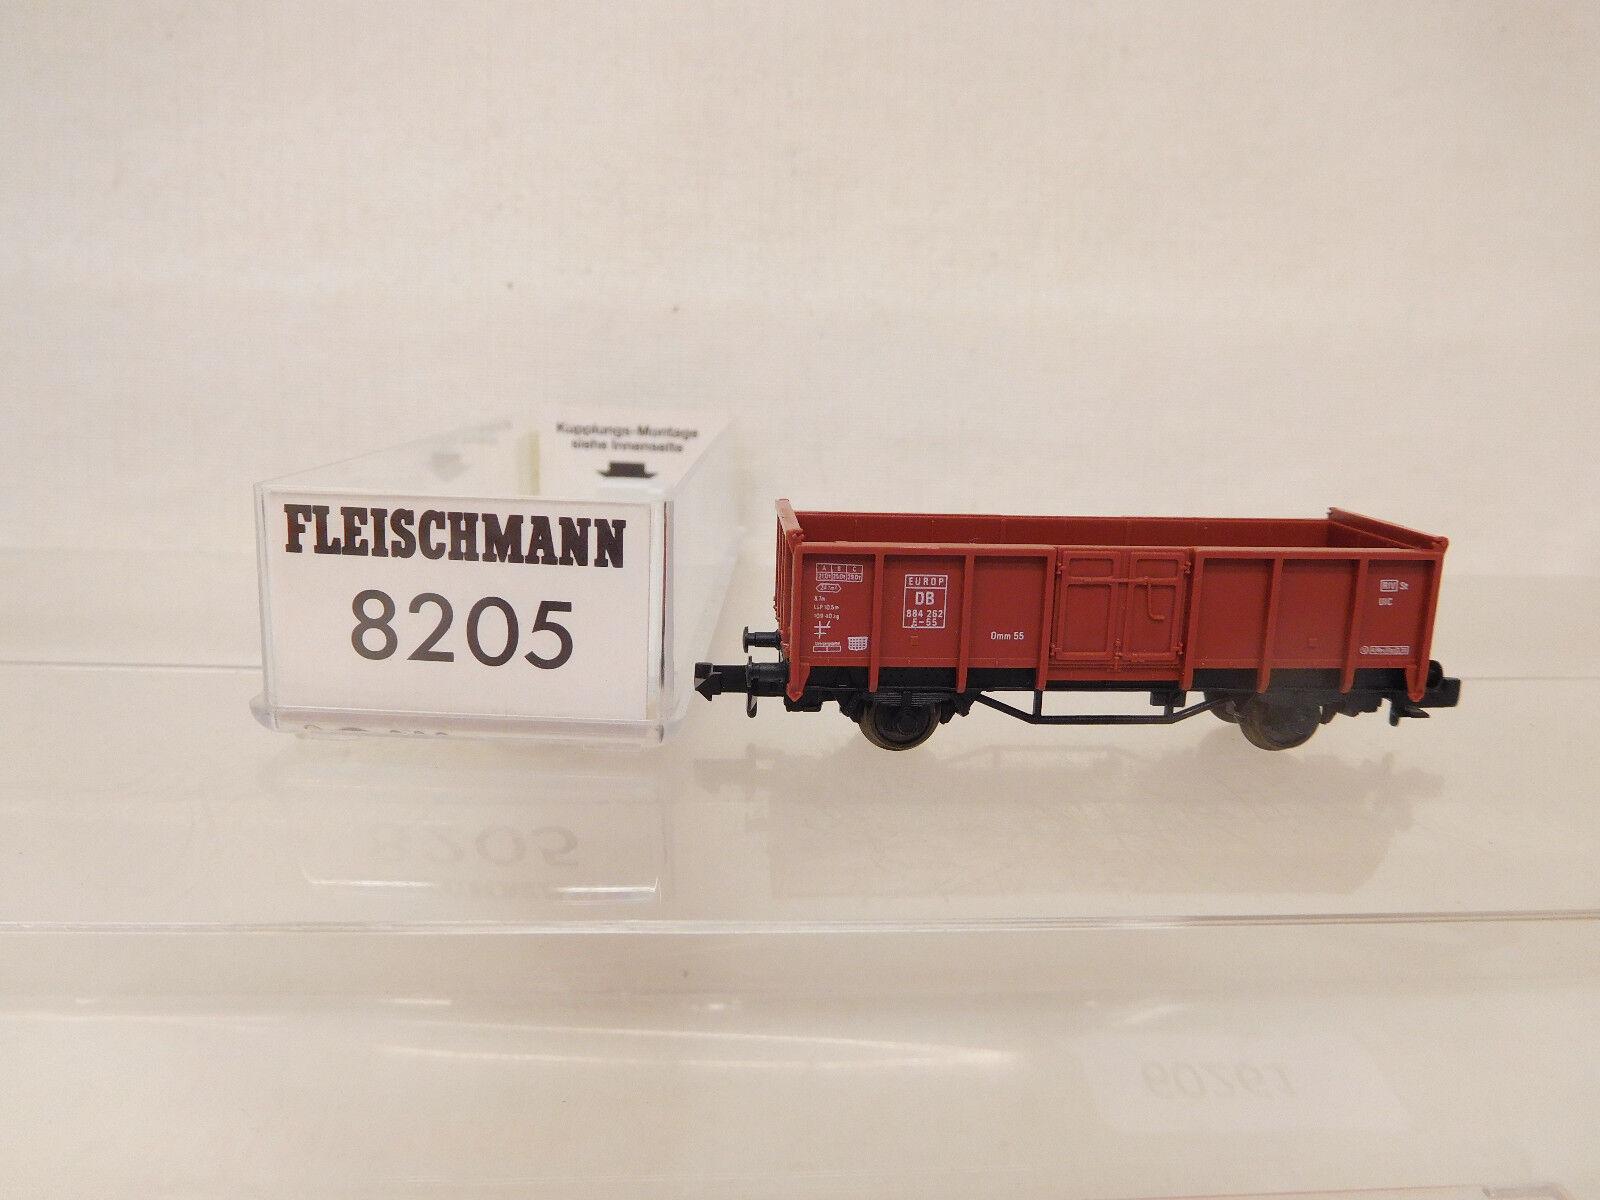 Mes-60261 8205 Fleischmann pista n n n vagones DB 884262 muy buen estado,  caliente